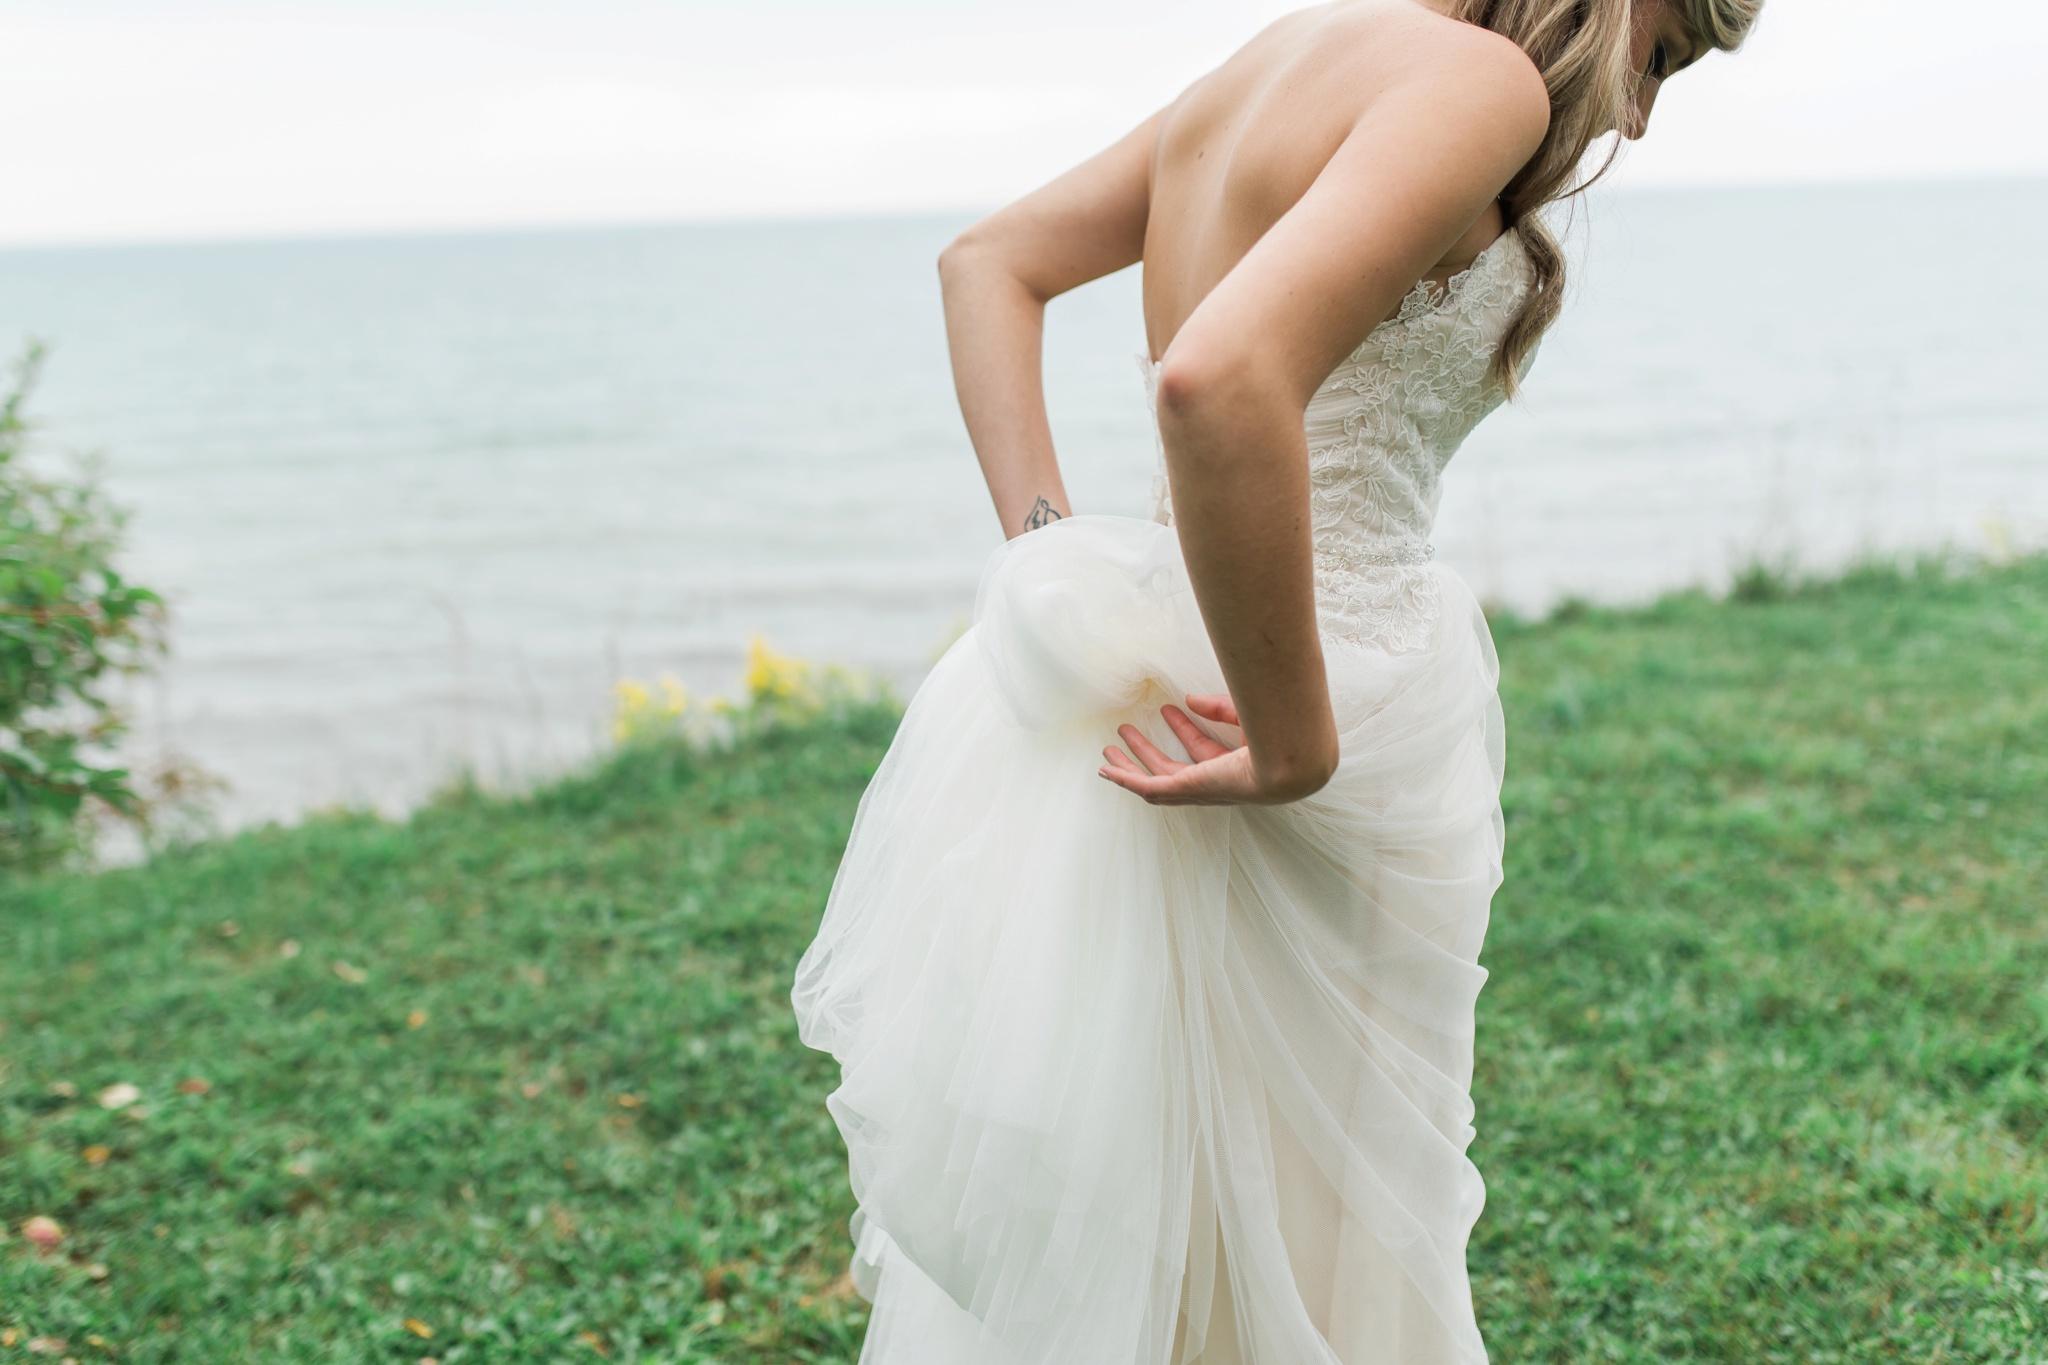 Maggie Sorreto Dress from Klienfileld